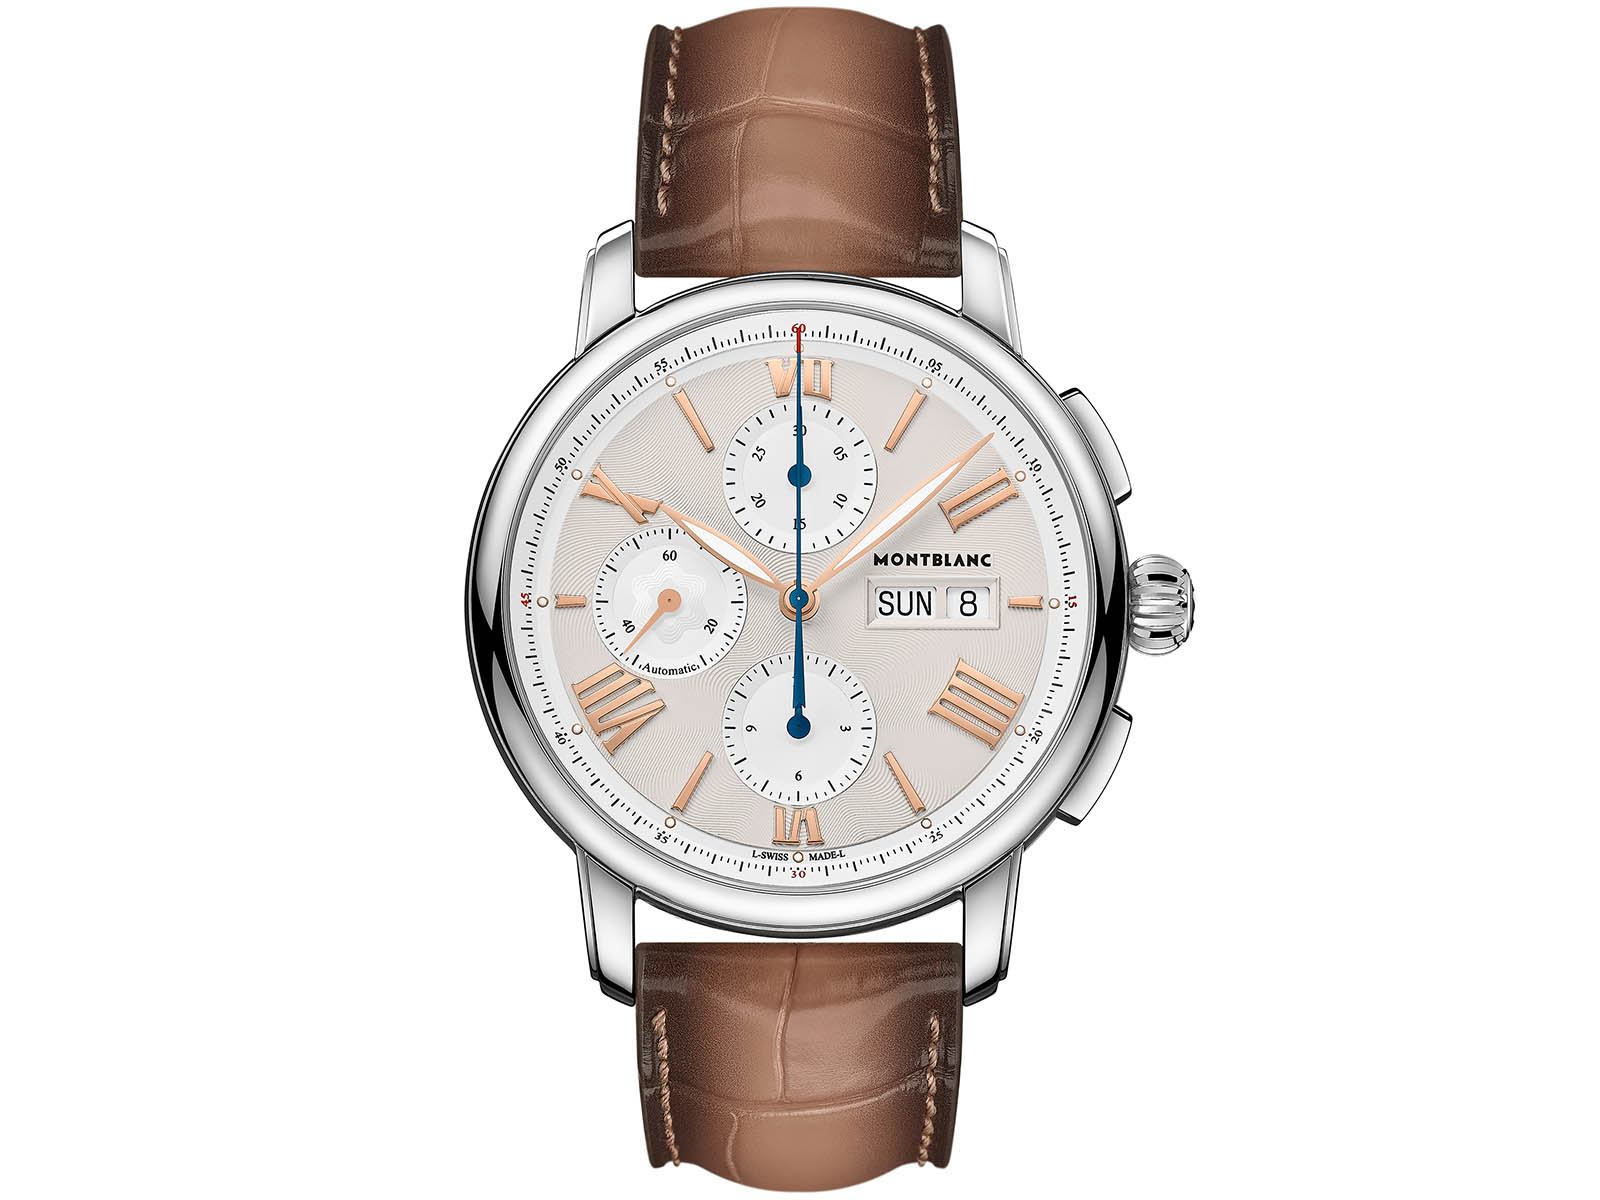 126080-montblanc-star-legacy-chronograph-day-date-1.jpg